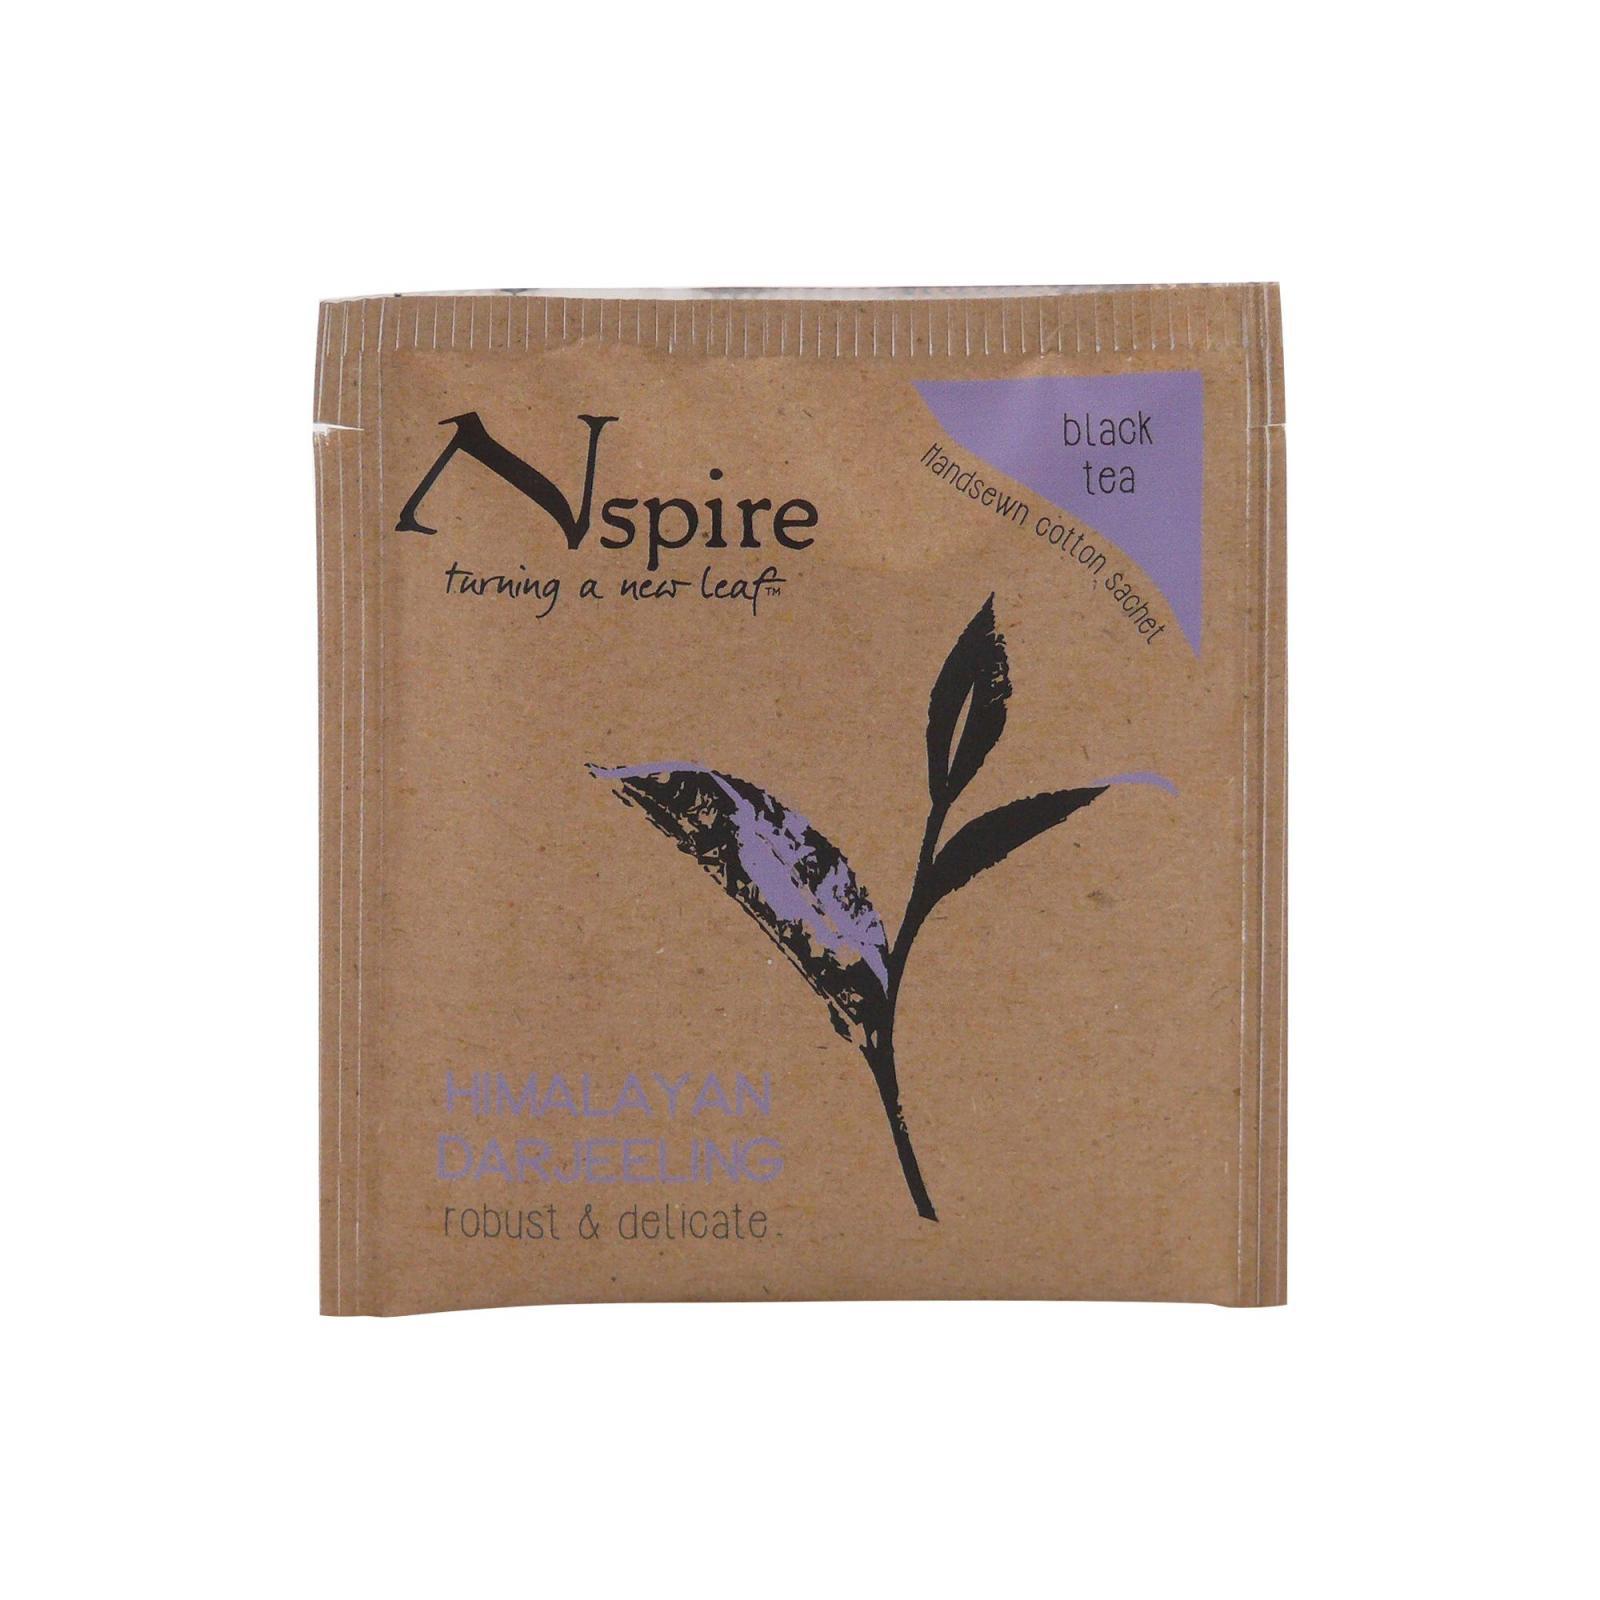 Numi Organic Tea Černý čaj Himalayan Darjeeling, Nspire Tea 2,9 g, 1 ks